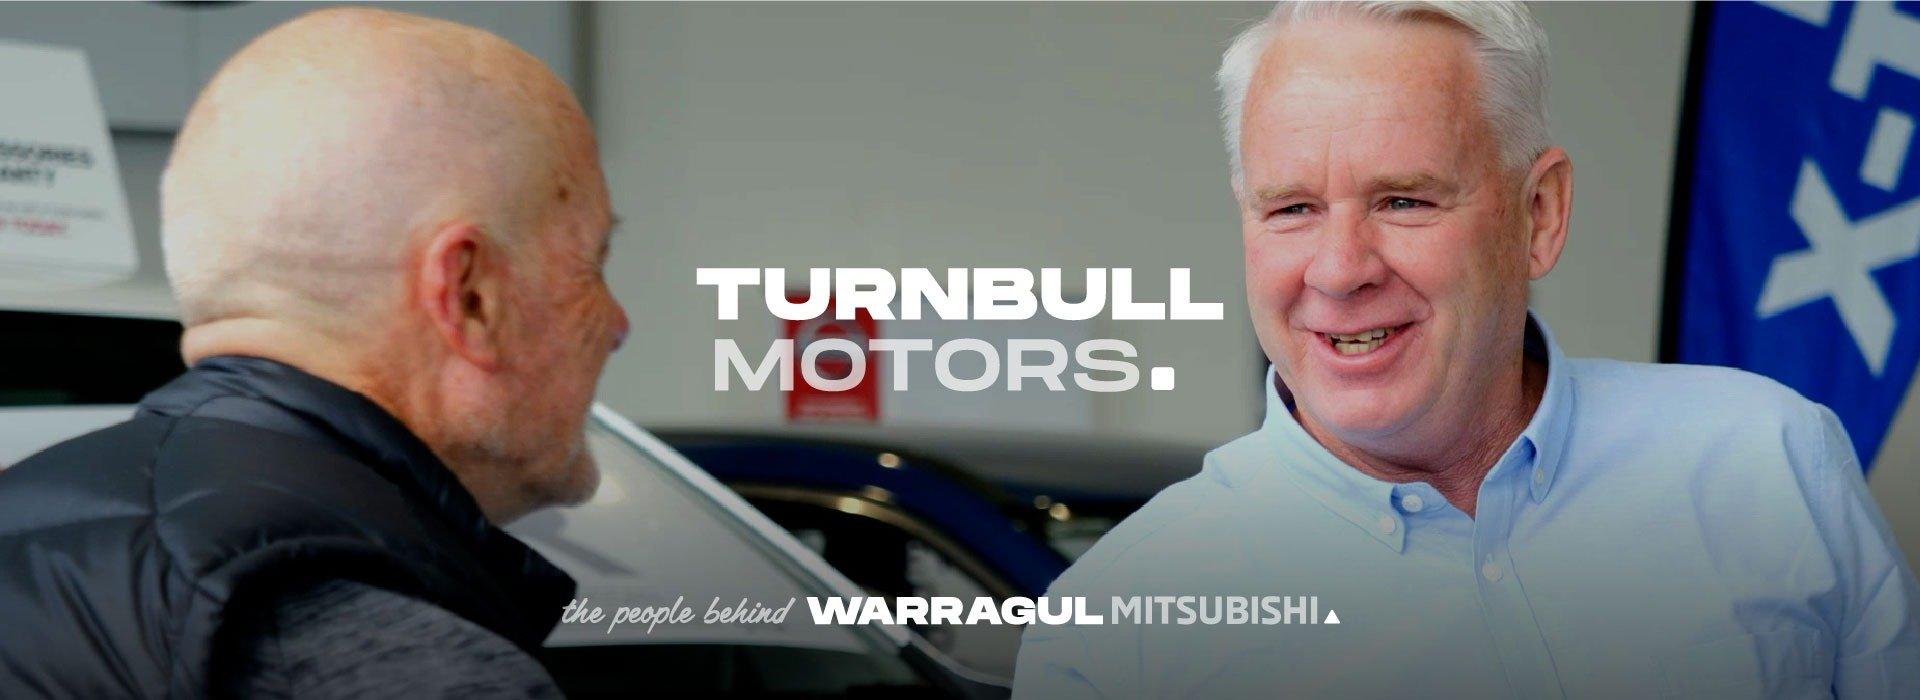 Warragul Mitsubishi Turbull Motors